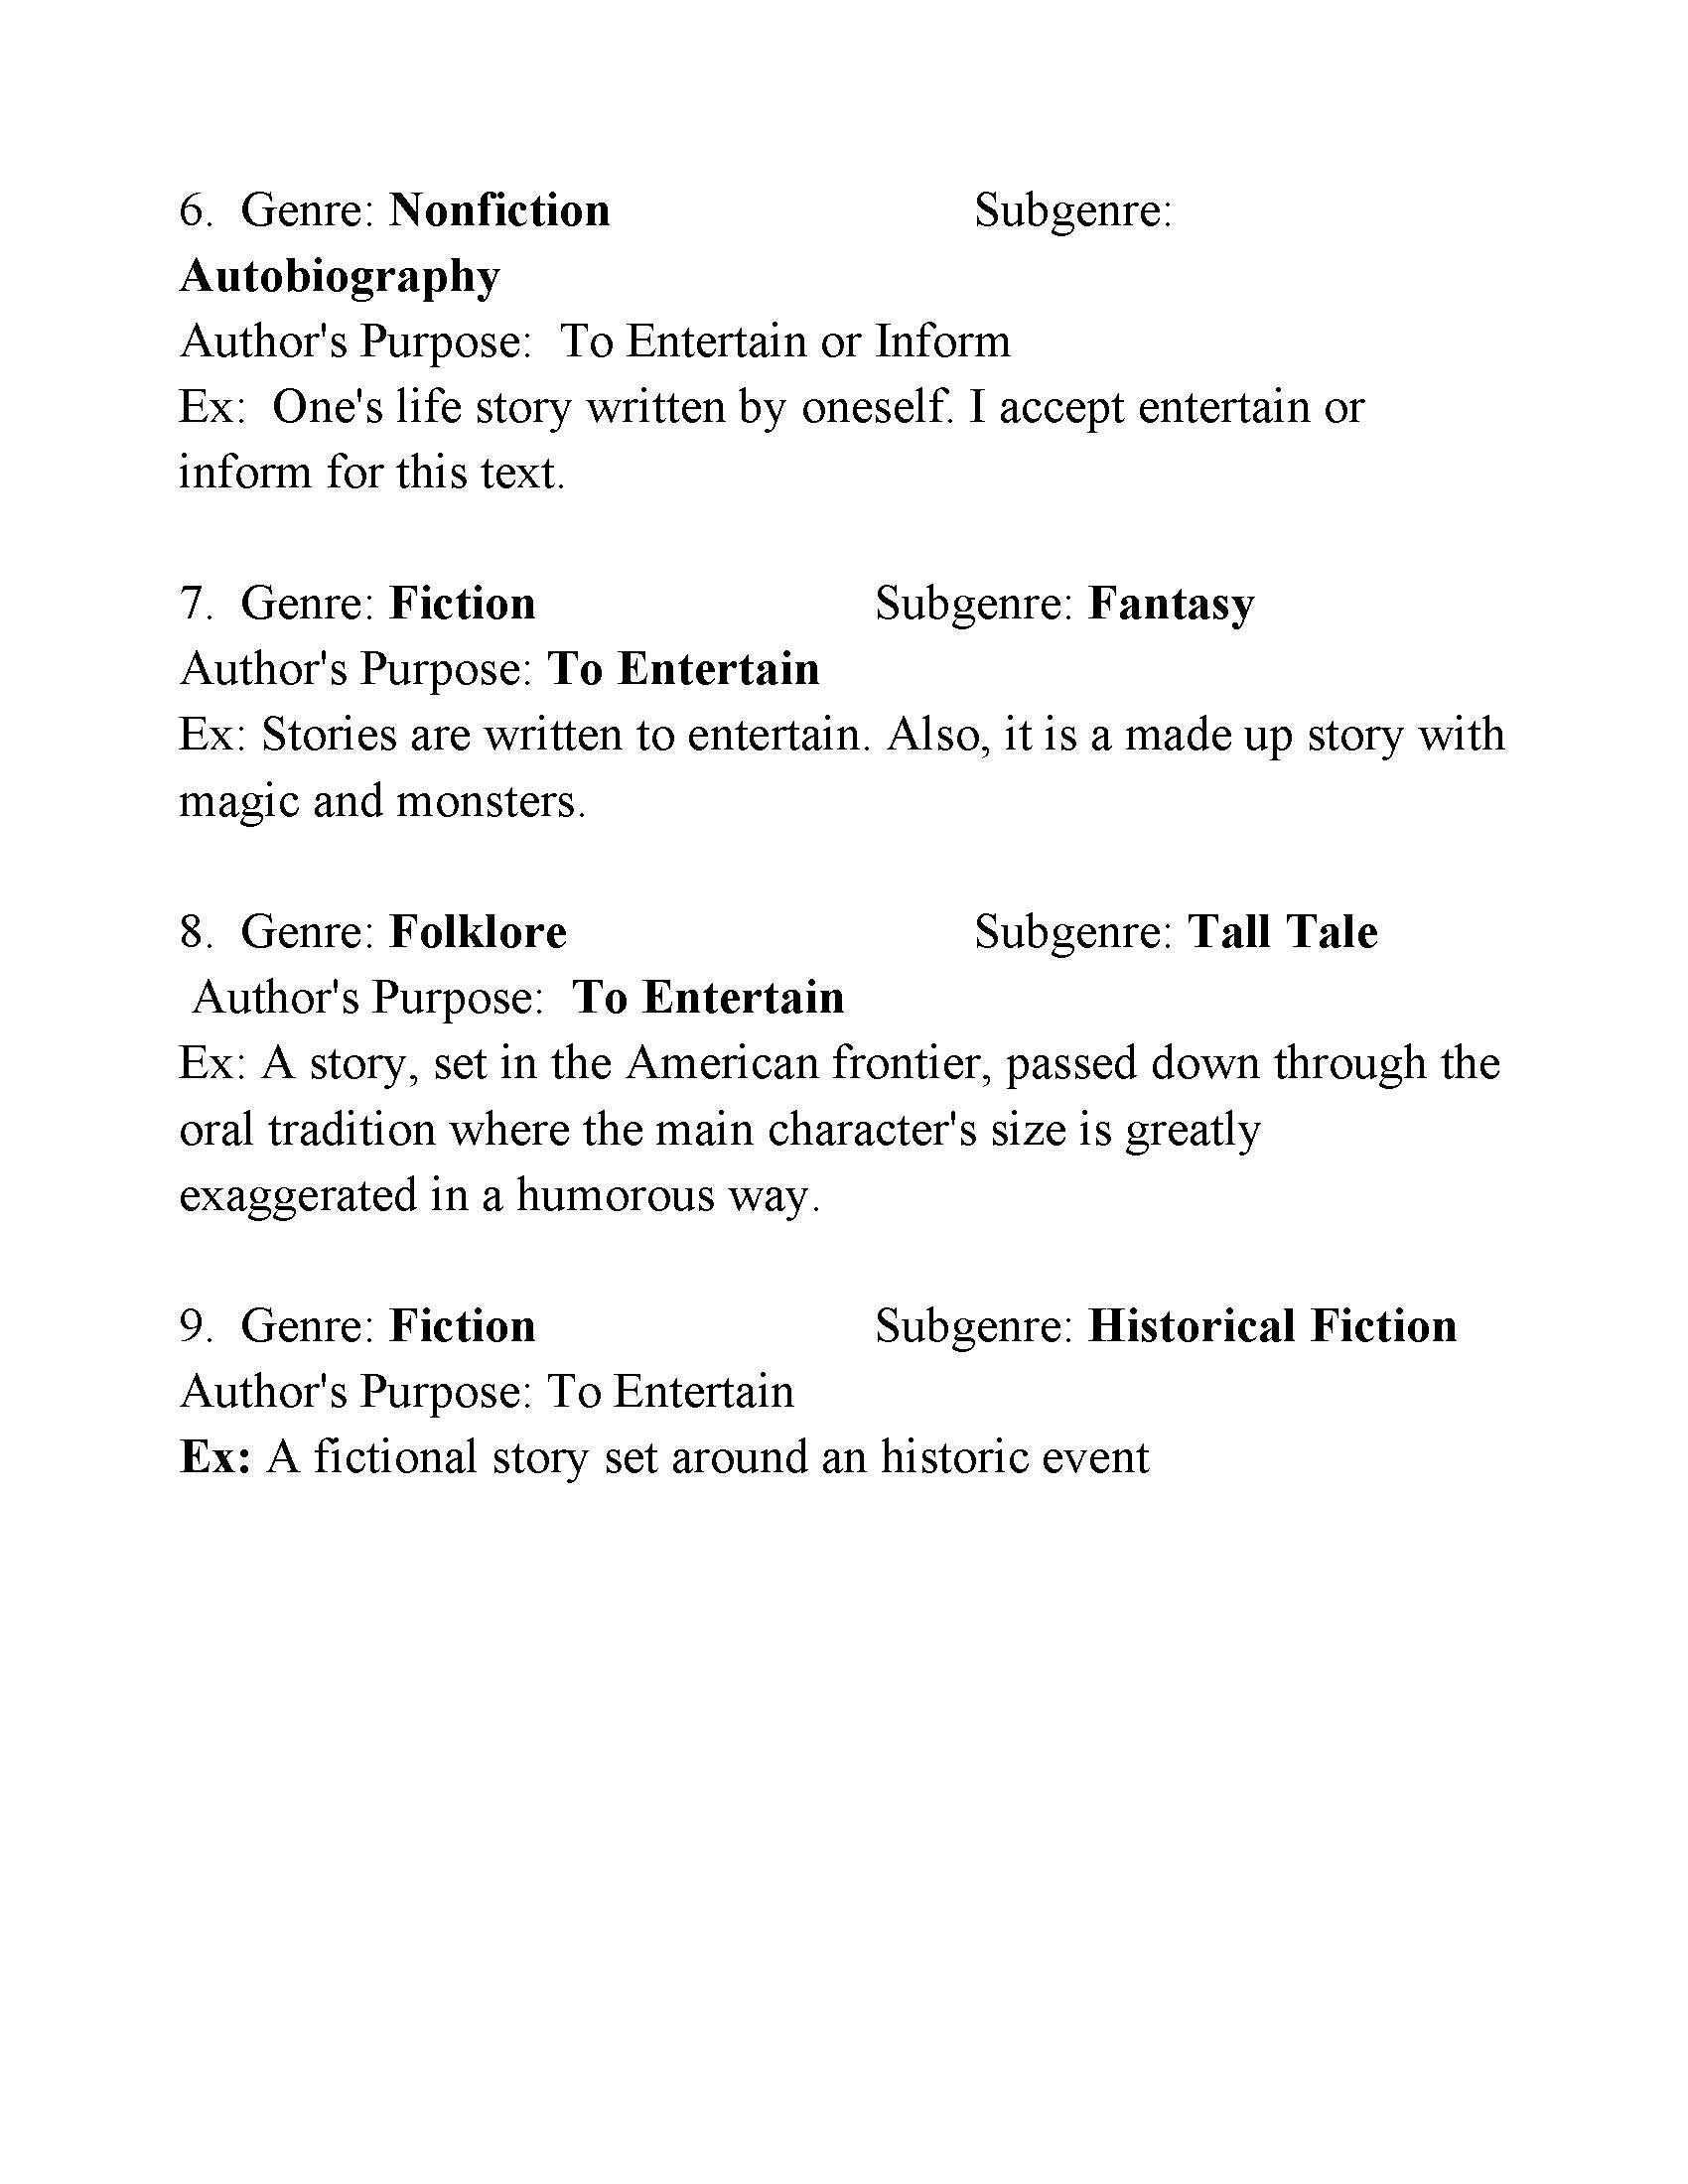 Identifying Authors Purpose Worksheet